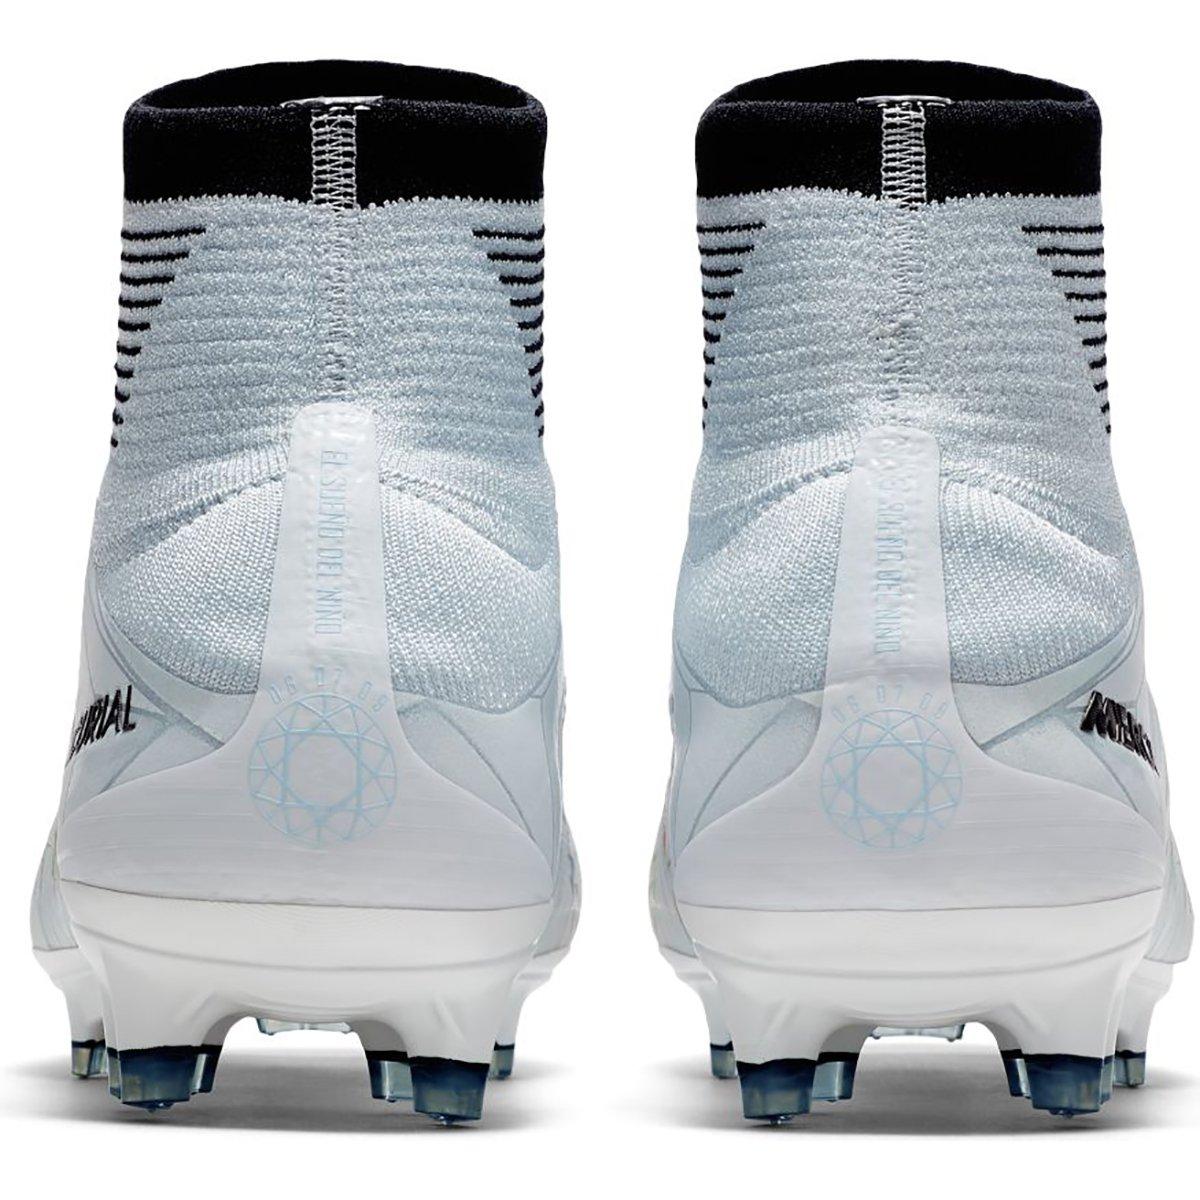 6e3d5e74b6e7 Nike Mercurial Superfly V CR7 FG Football Boot Football Boots   Amazon.co.uk  Sports   Outdoors